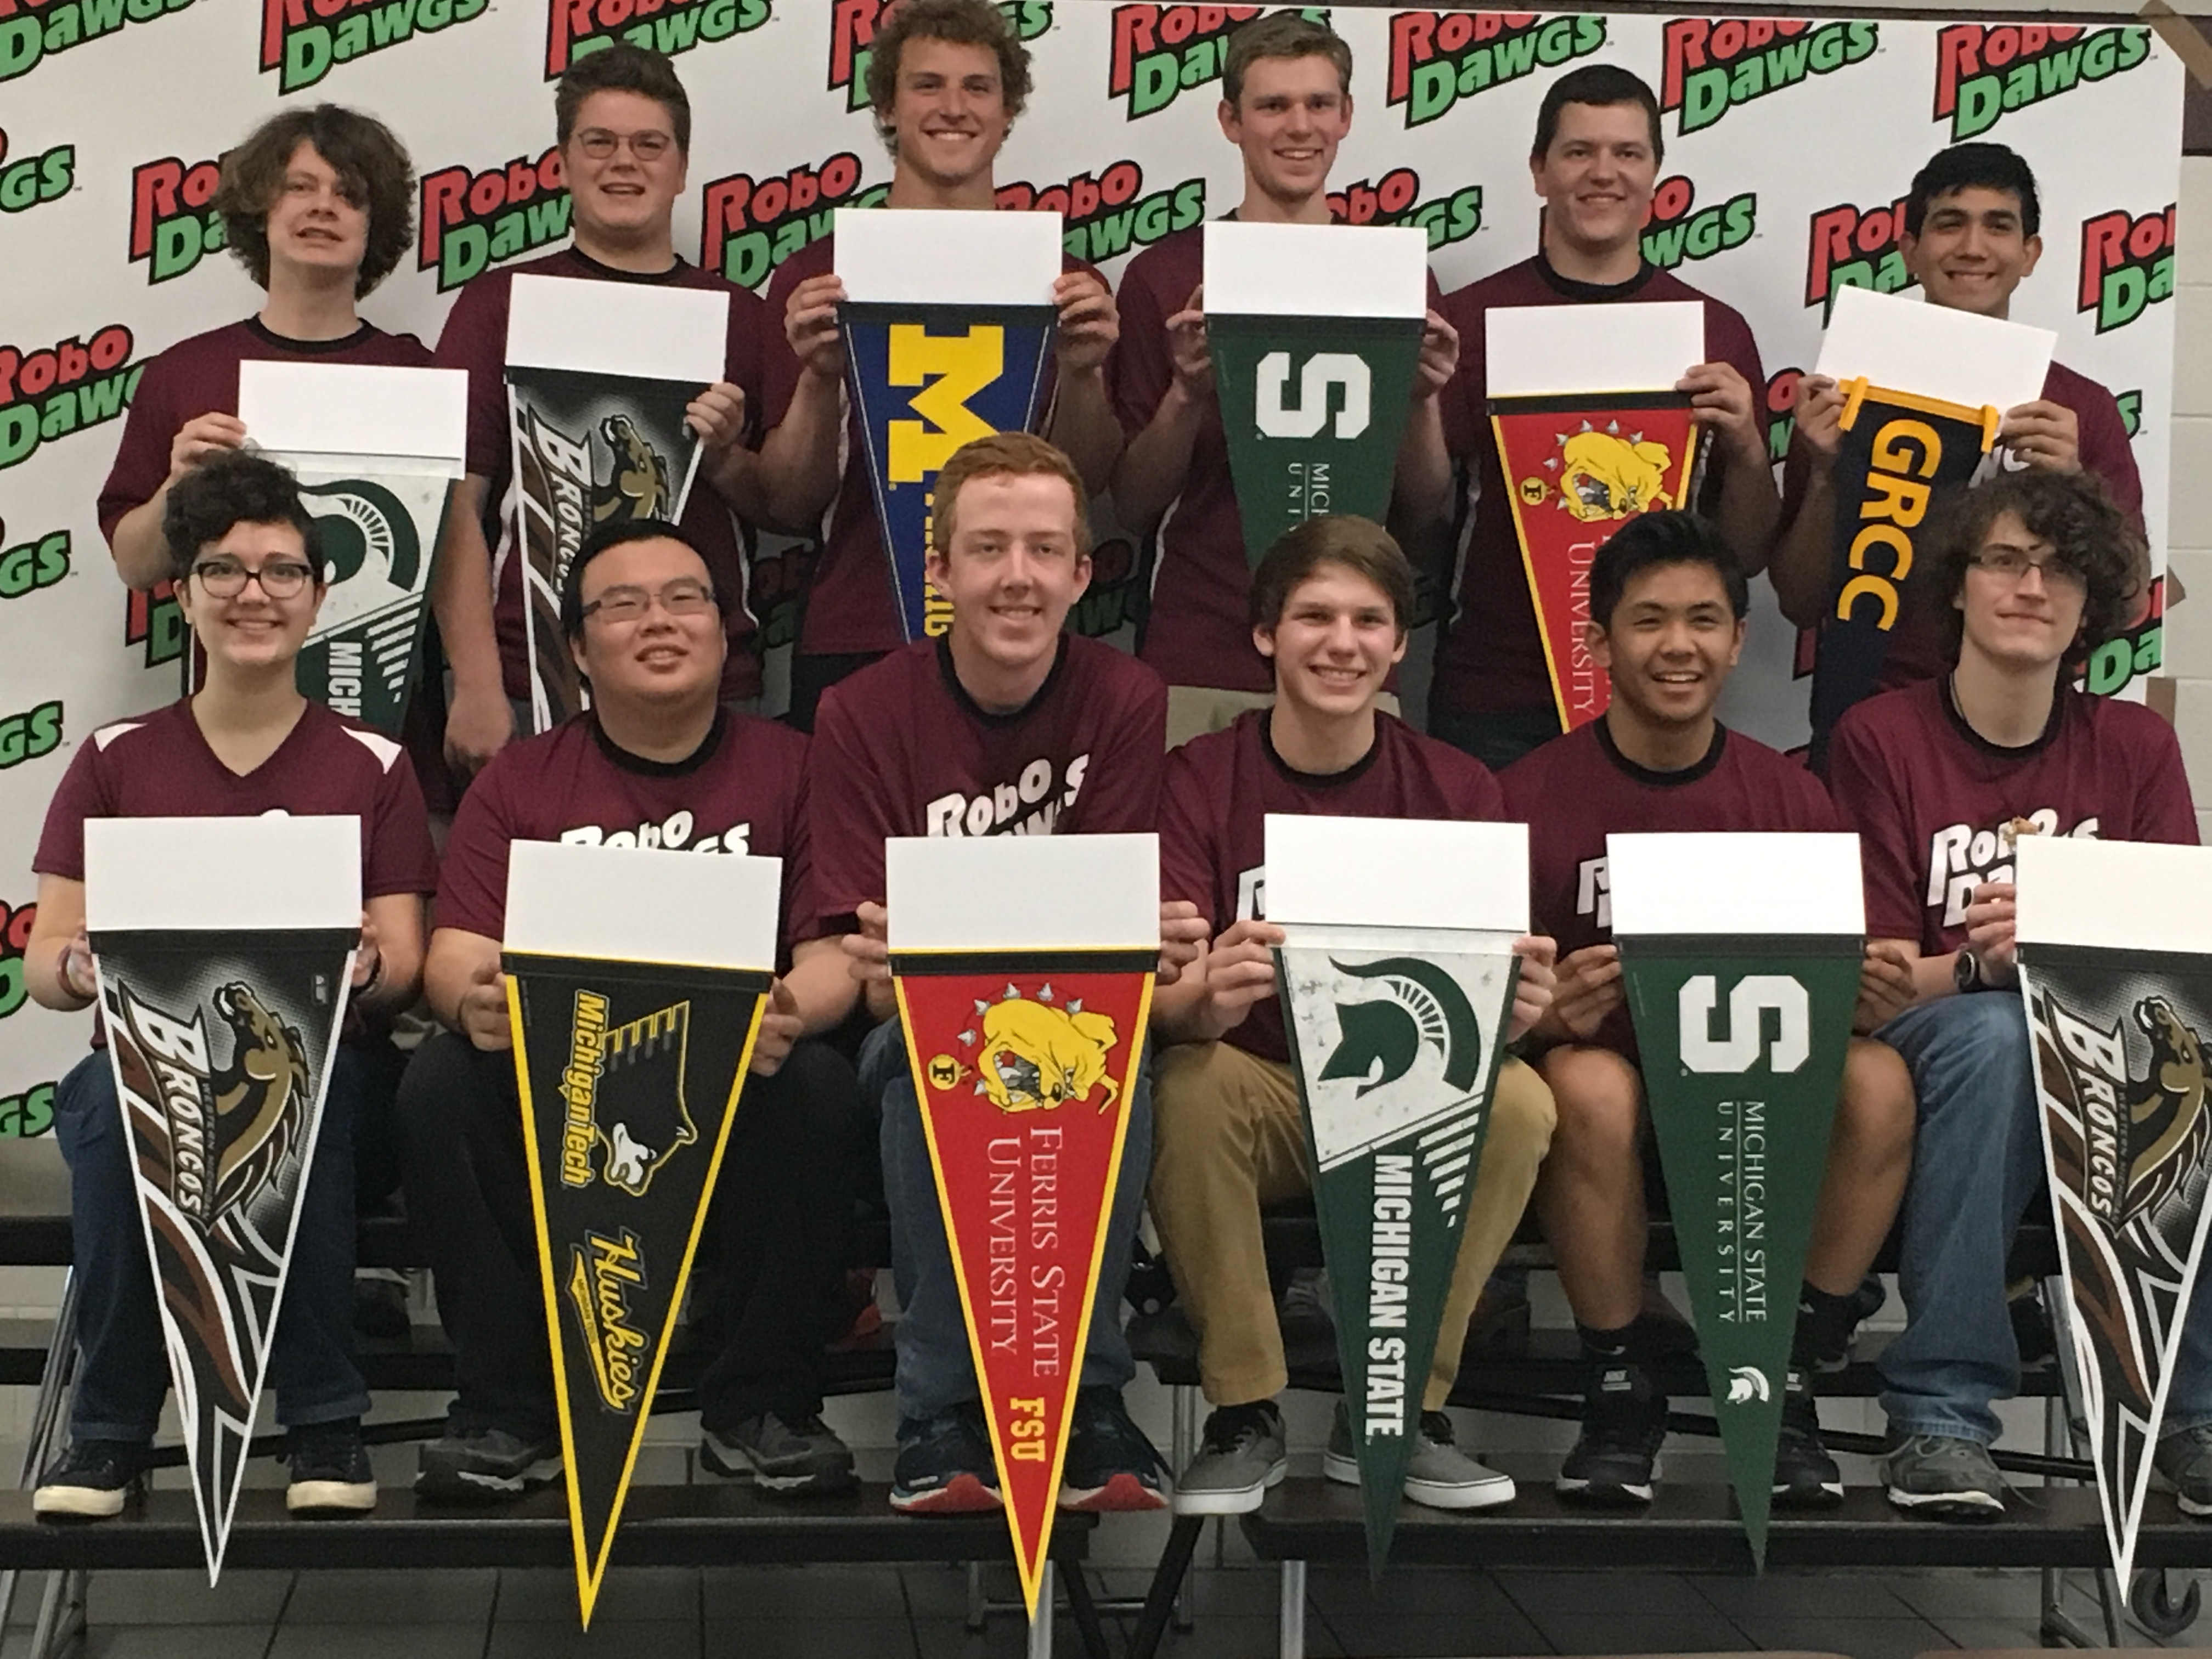 2017 GHS RoboDawg Graduates